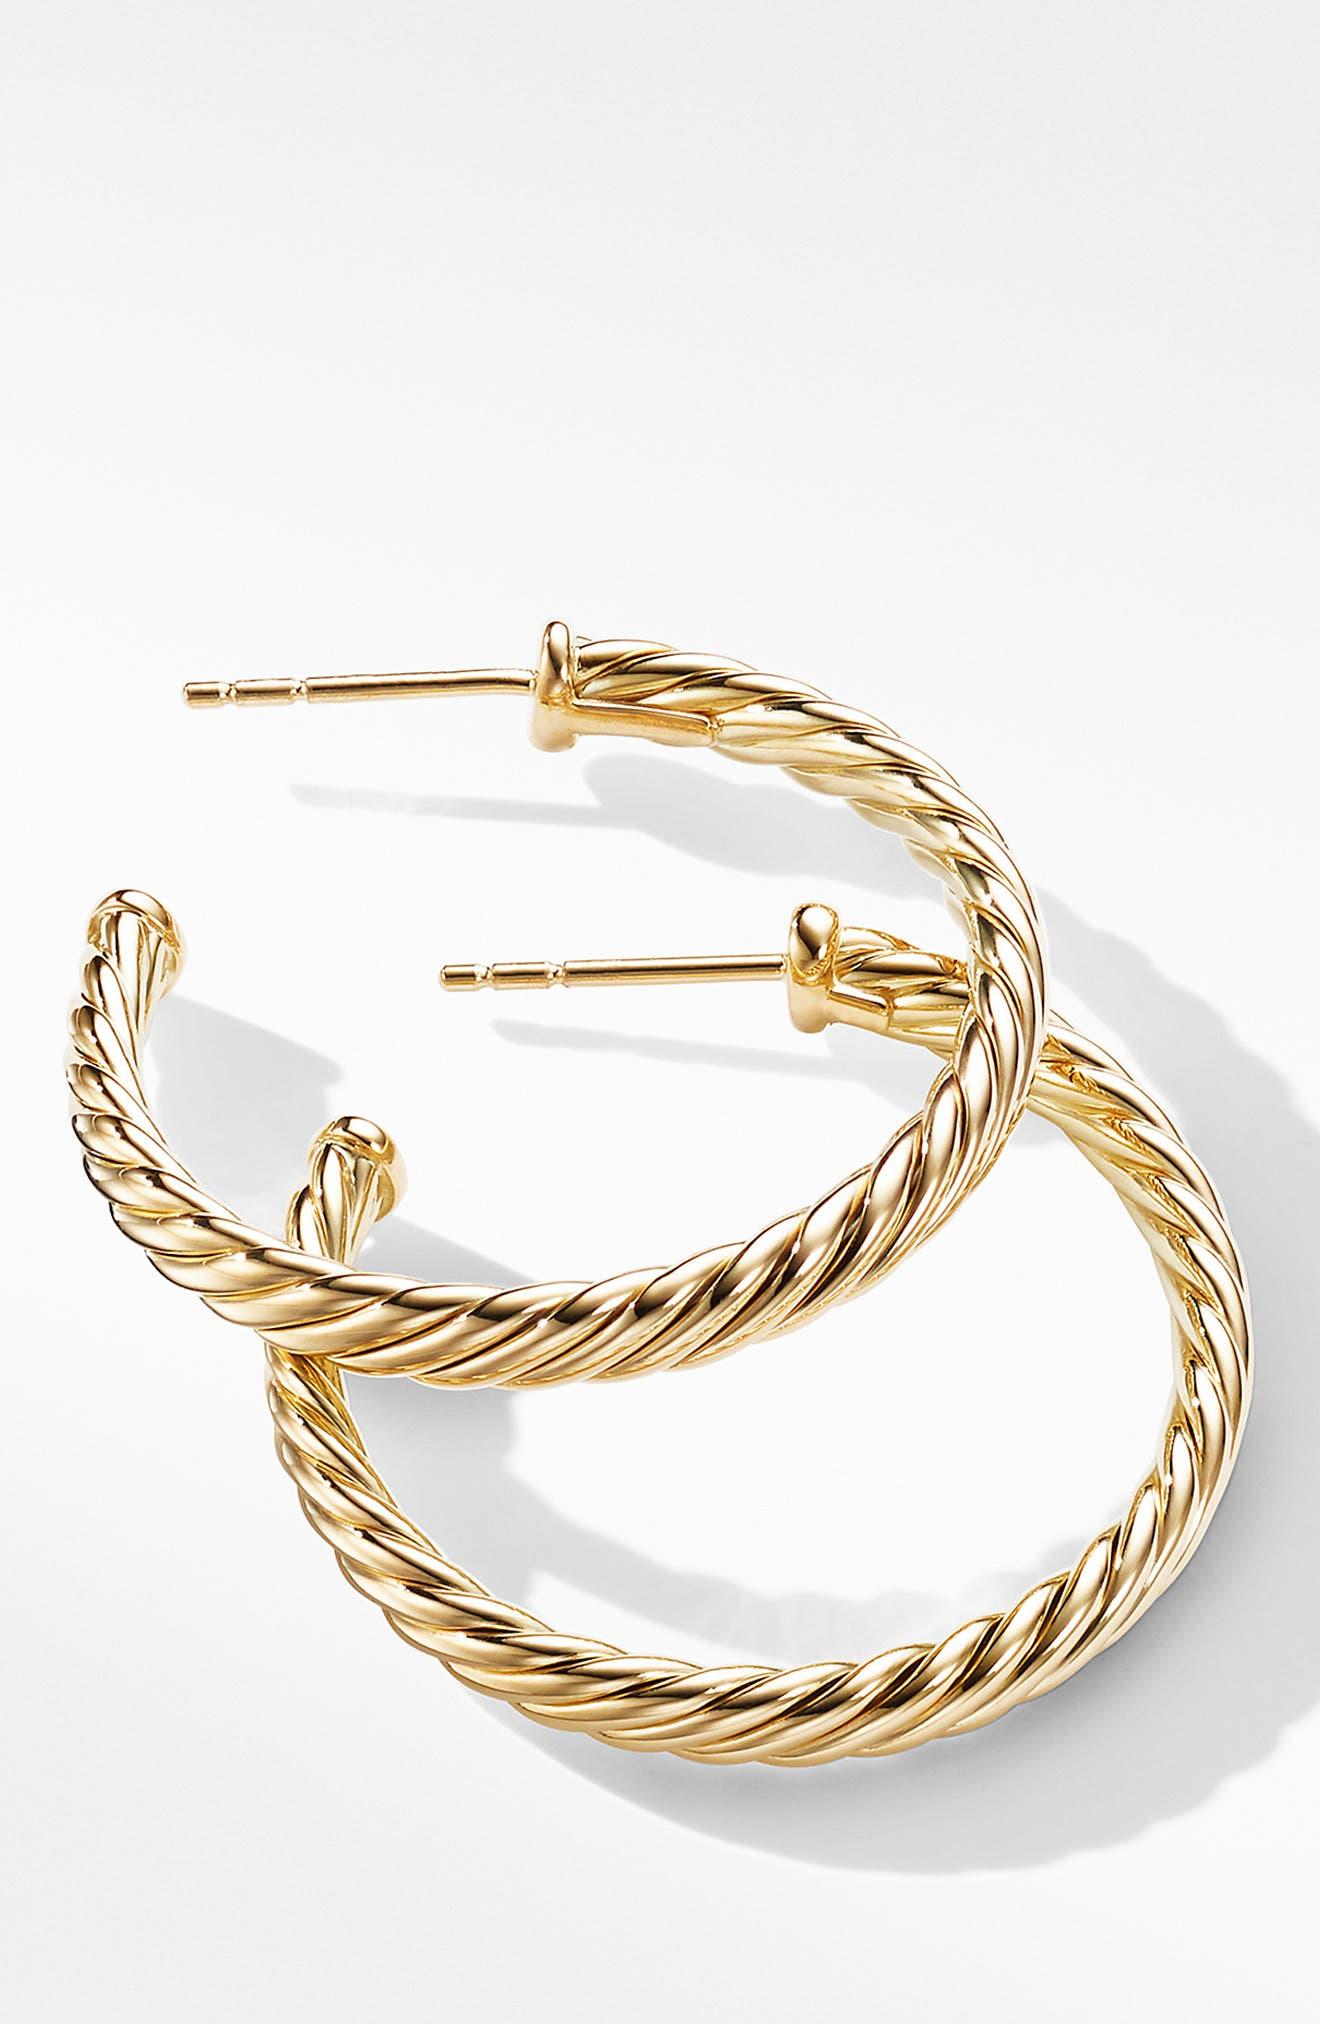 DAVID YURMAN, Cable Loop Hoop Earrings, Alternate thumbnail 2, color, GOLD